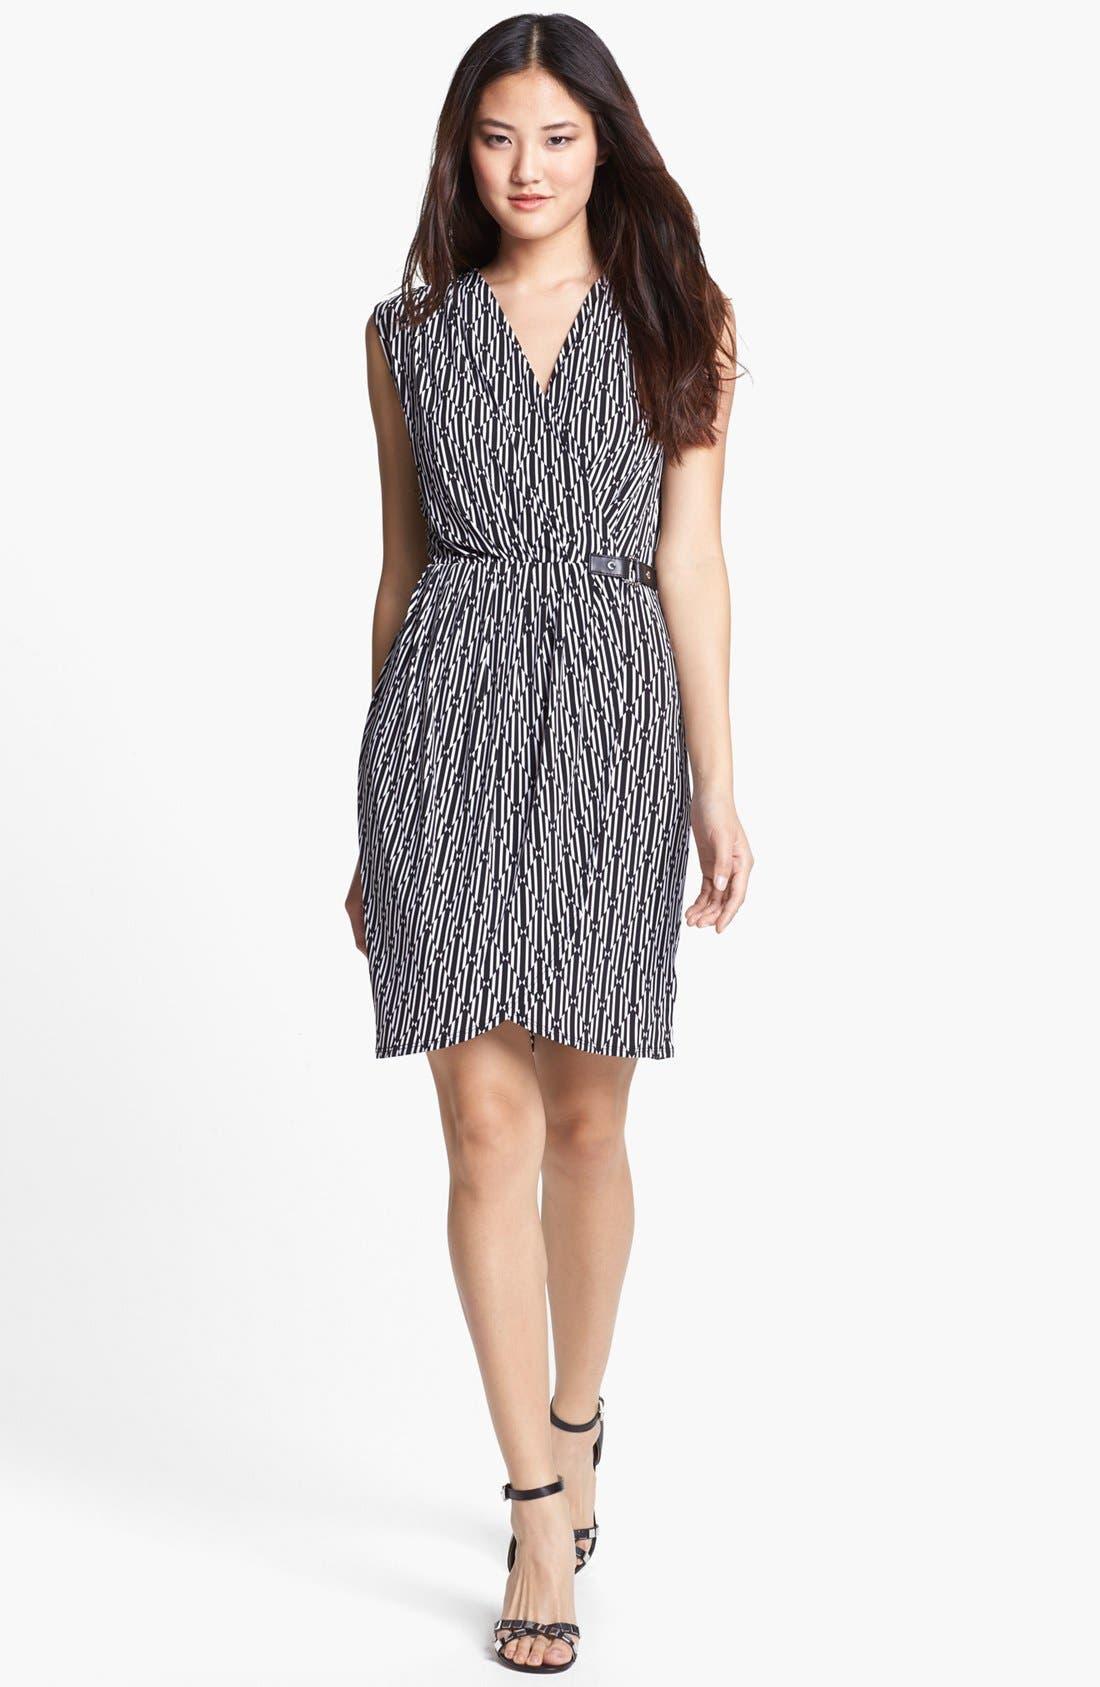 Alternate Image 1 Selected - MICHAEL Michael Kors Sleeveless Faux Wrap Dress (Petite)